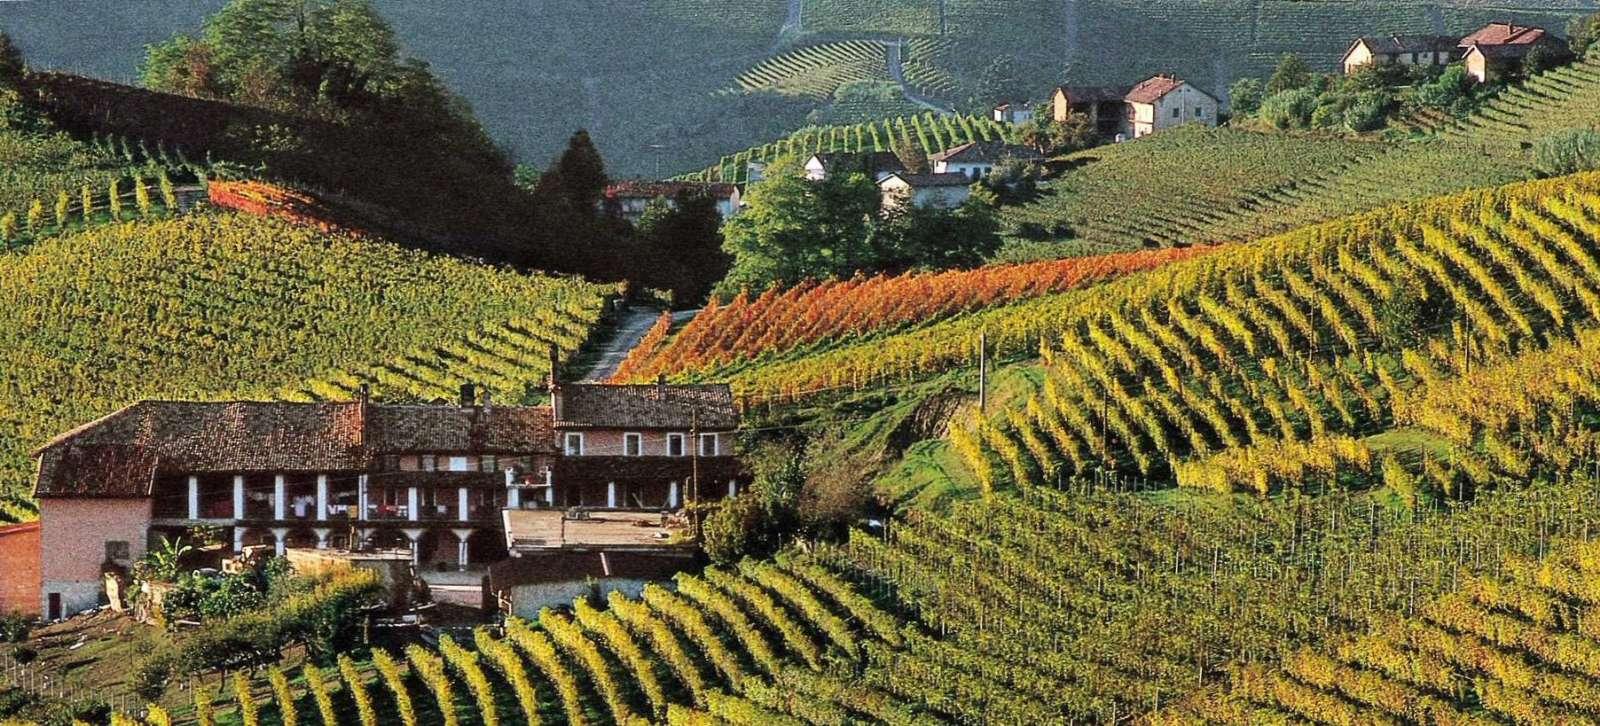 Piemontes böljande vinmarker